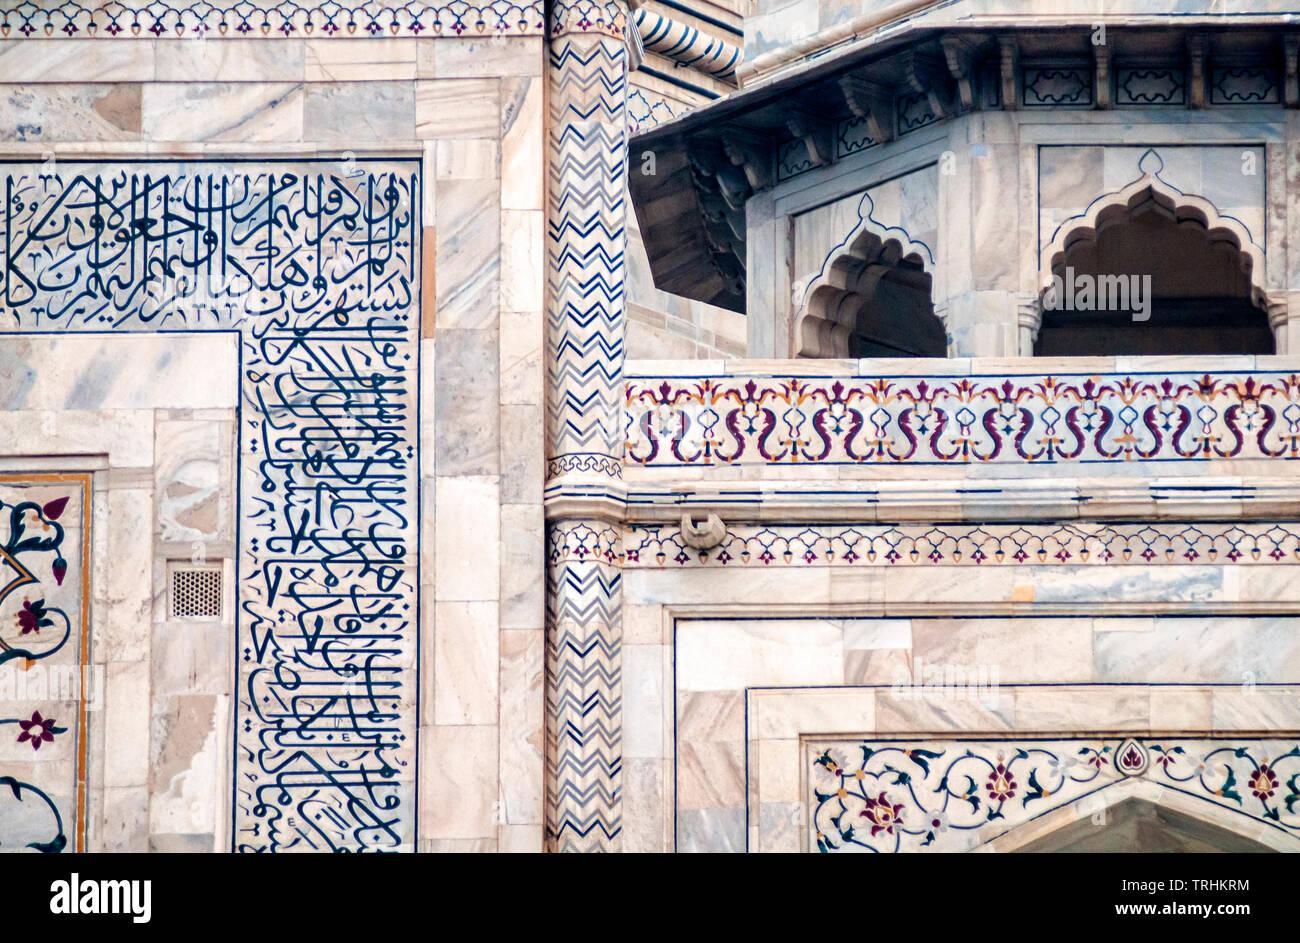 Detail of the Taj Mahal in Agra, India Stock Photo